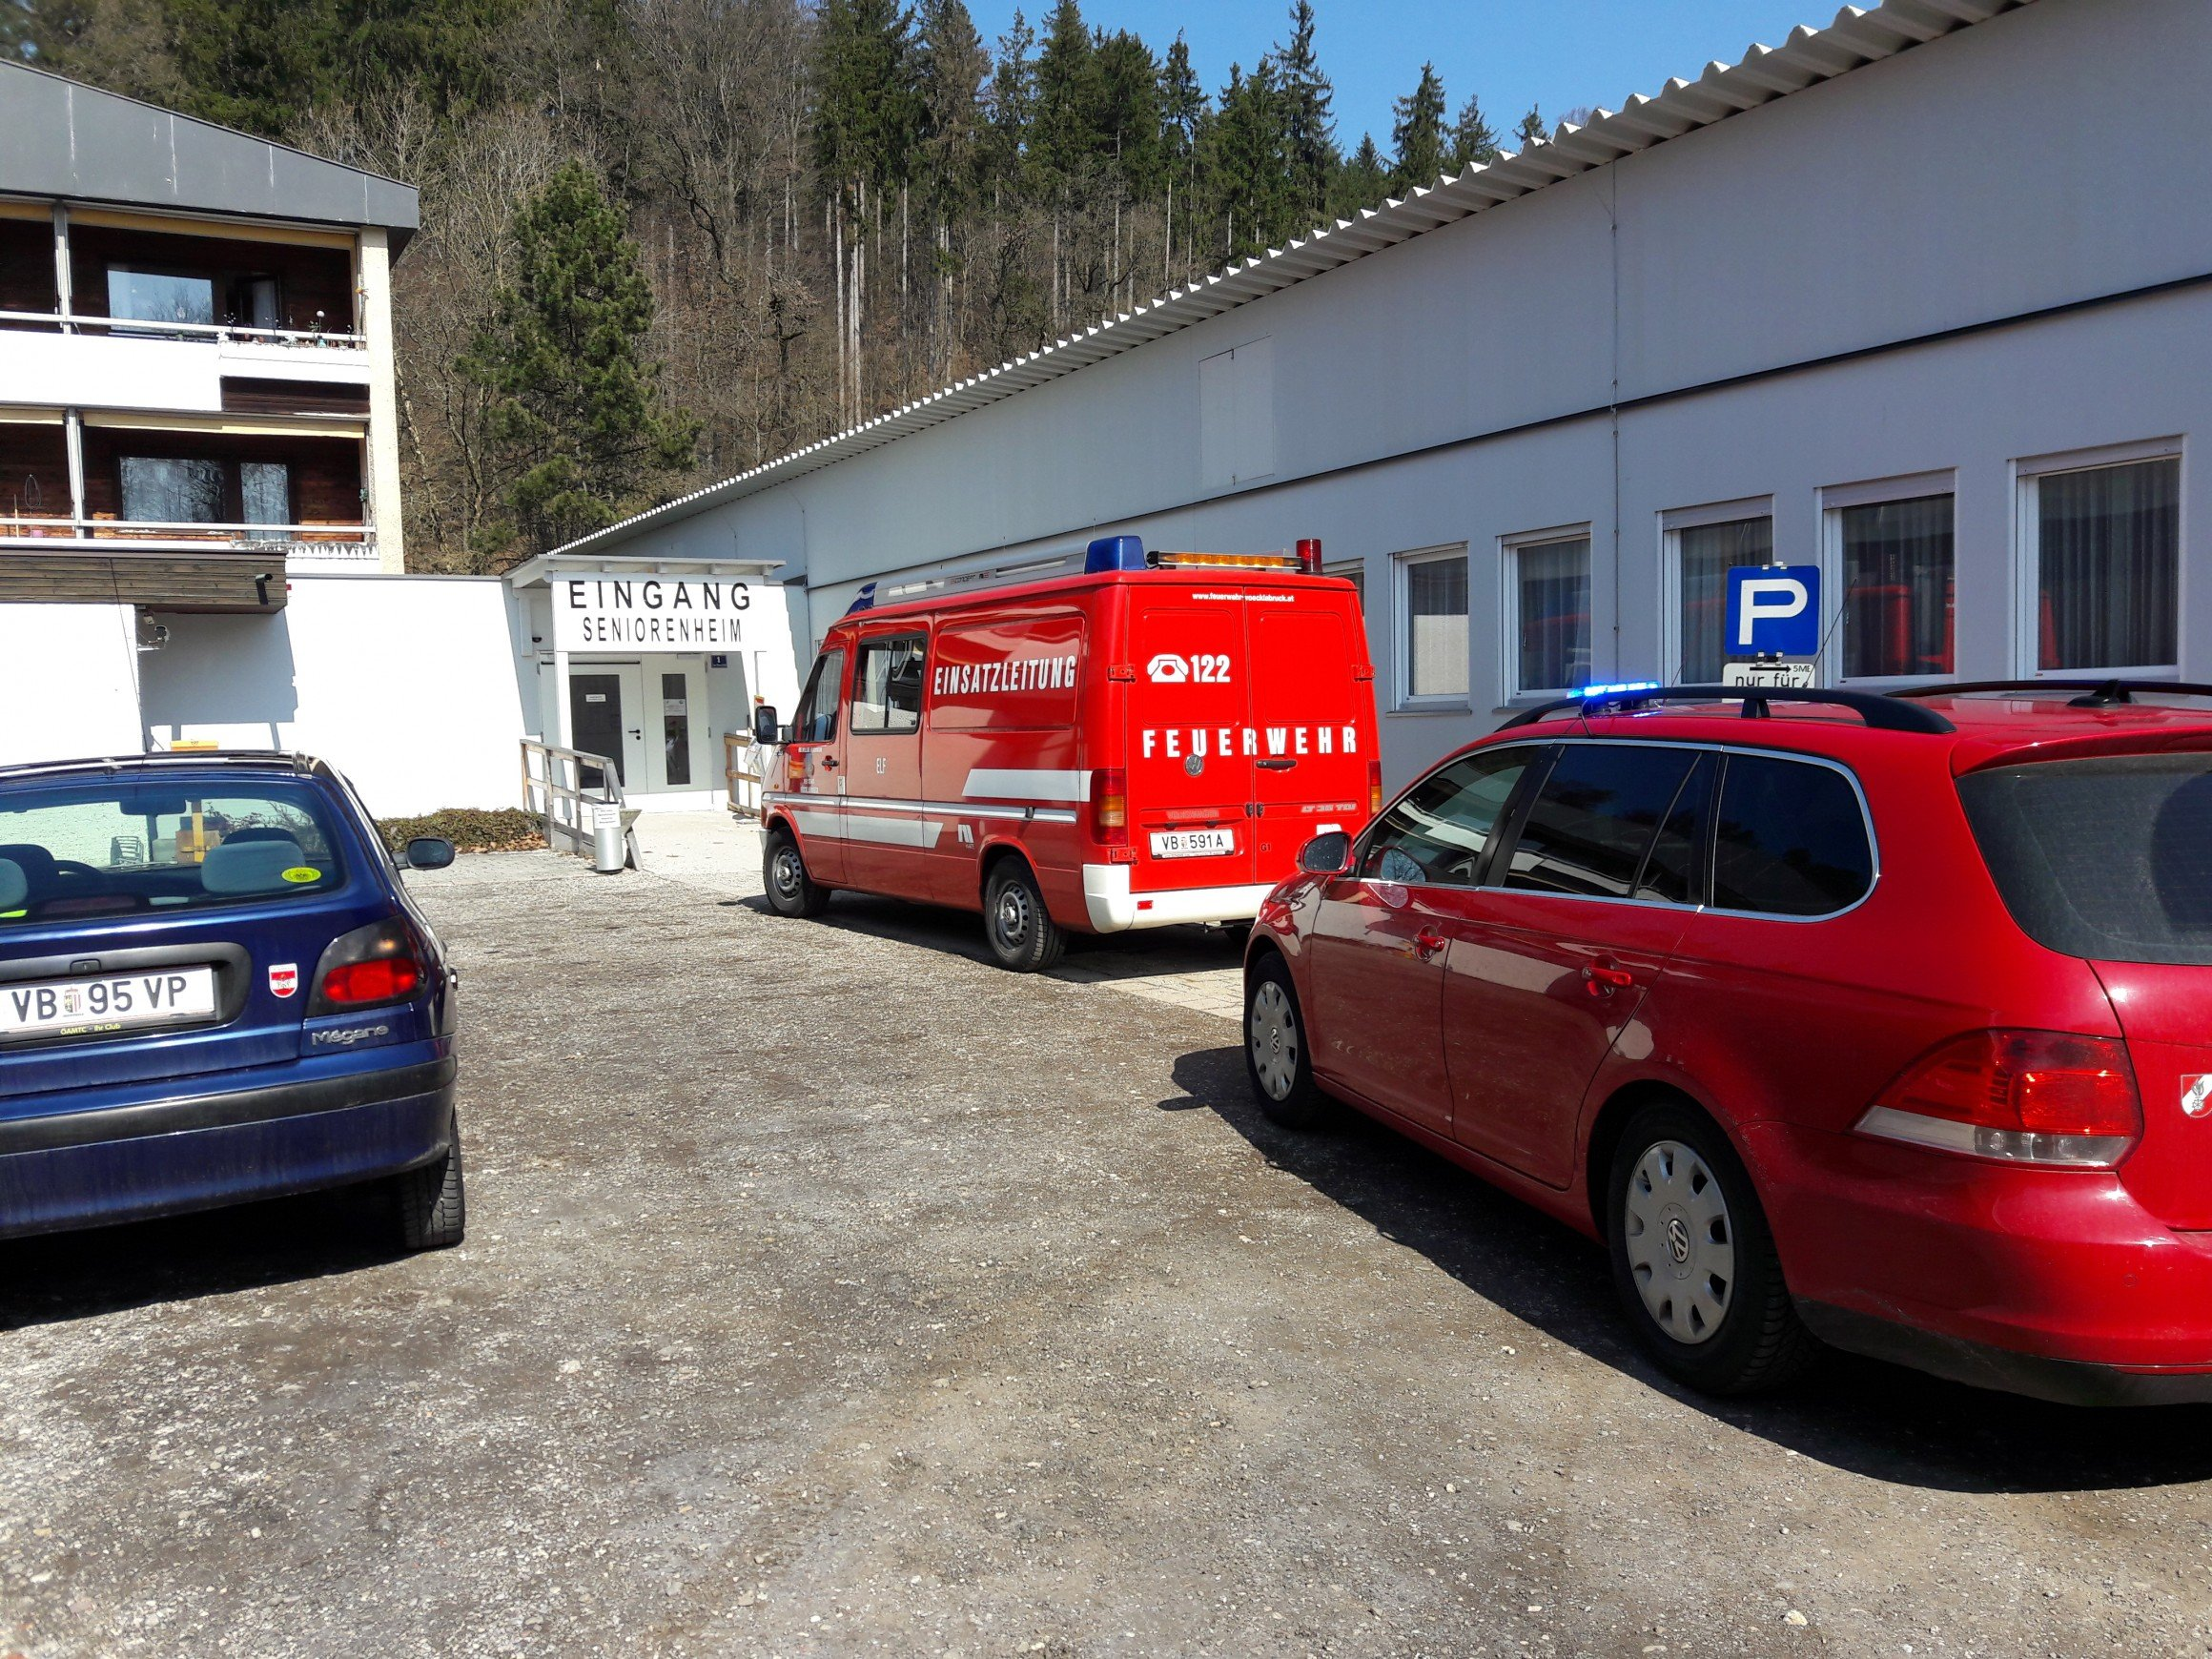 20180325 140400 - Brandmeldealarm städt. Seniorenheim